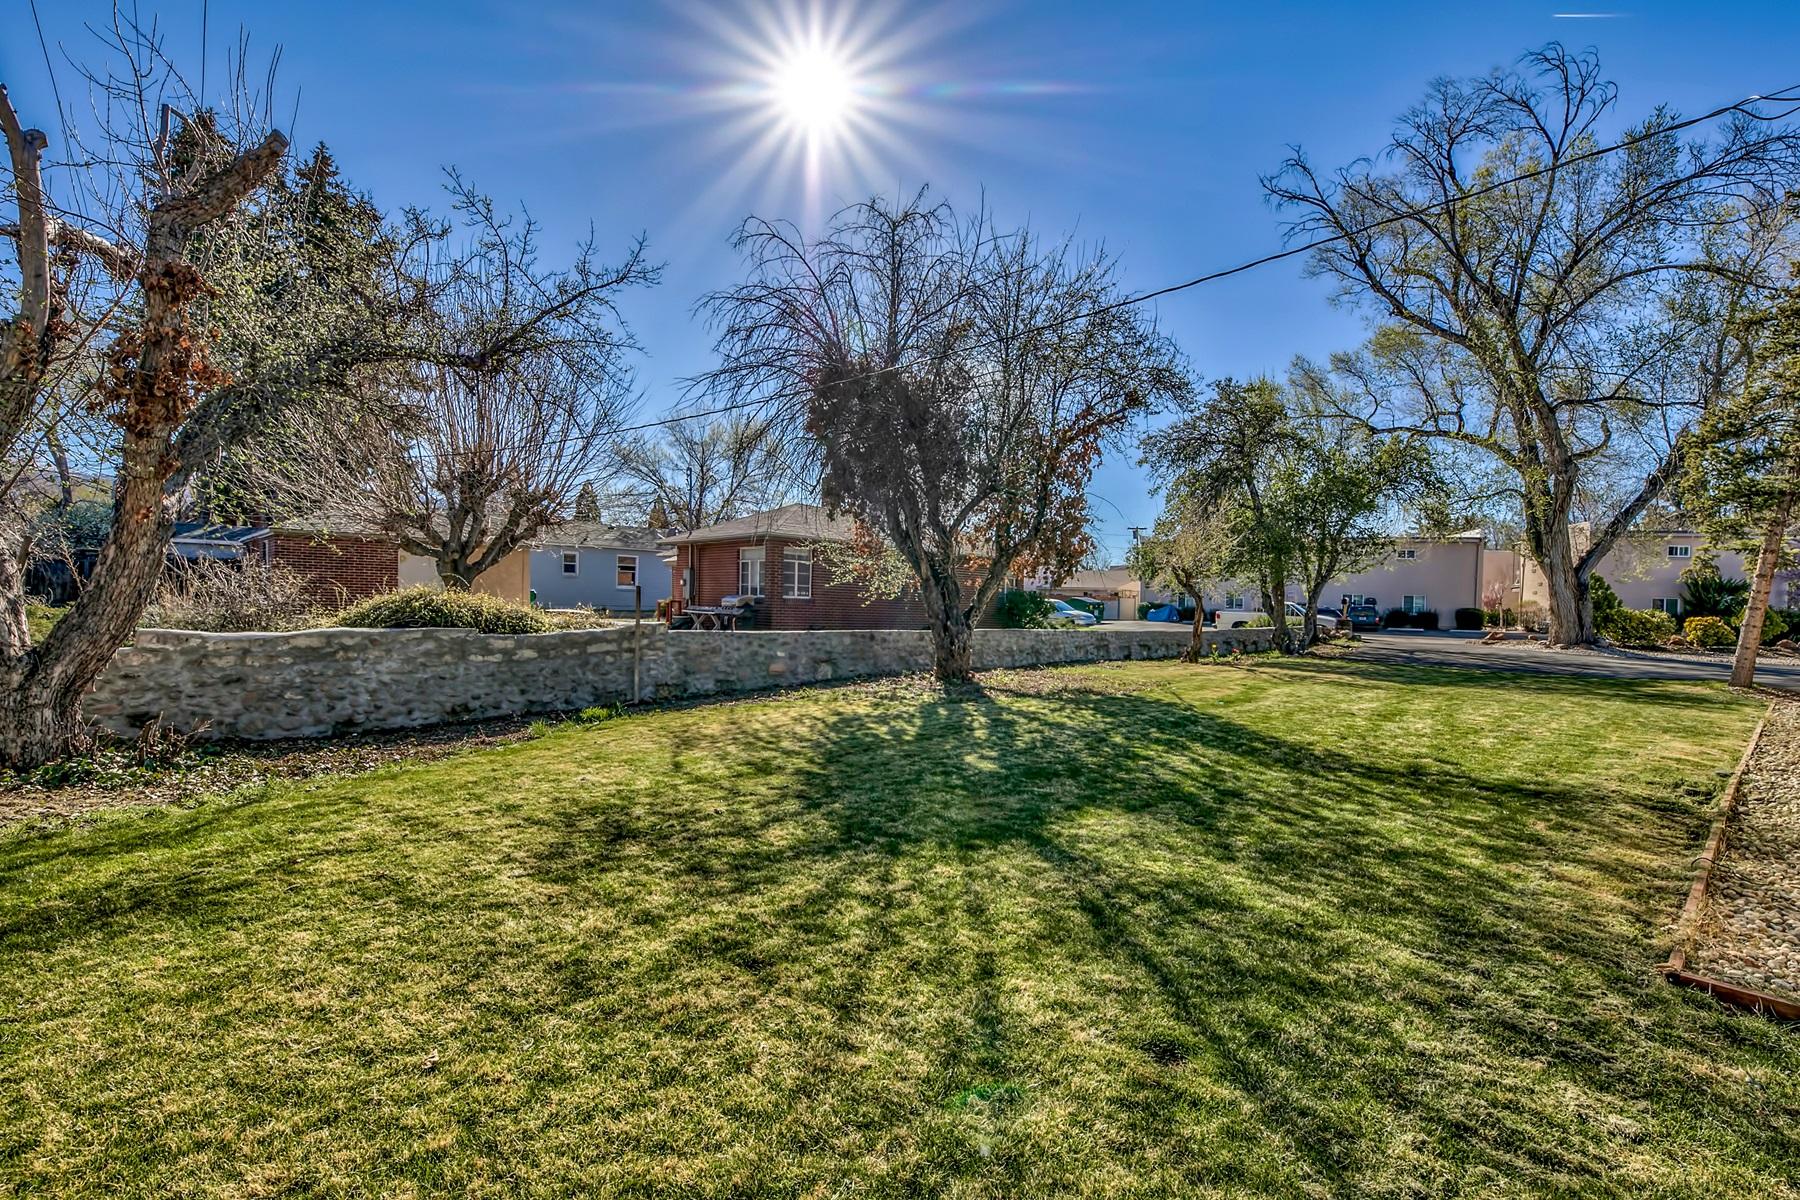 Additional photo for property listing at 2100 Riviera St, Reno NV 89509 2100 Riviera St. Reno, Nevada 89509 United States